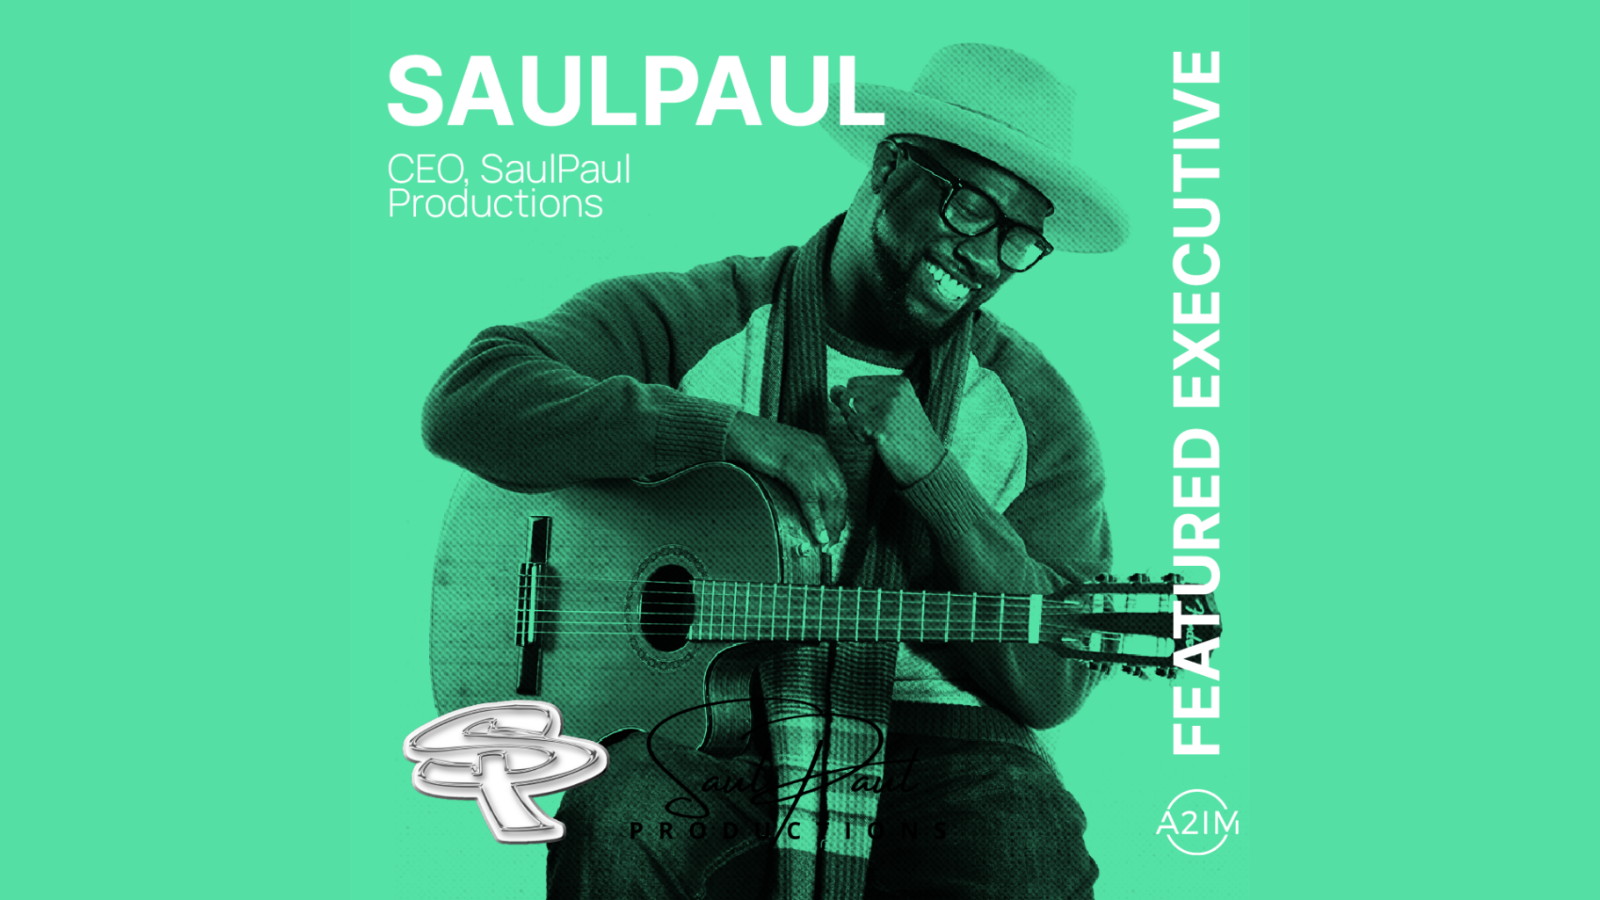 A2IM's Featured Executive Column Highlights SaulPaul